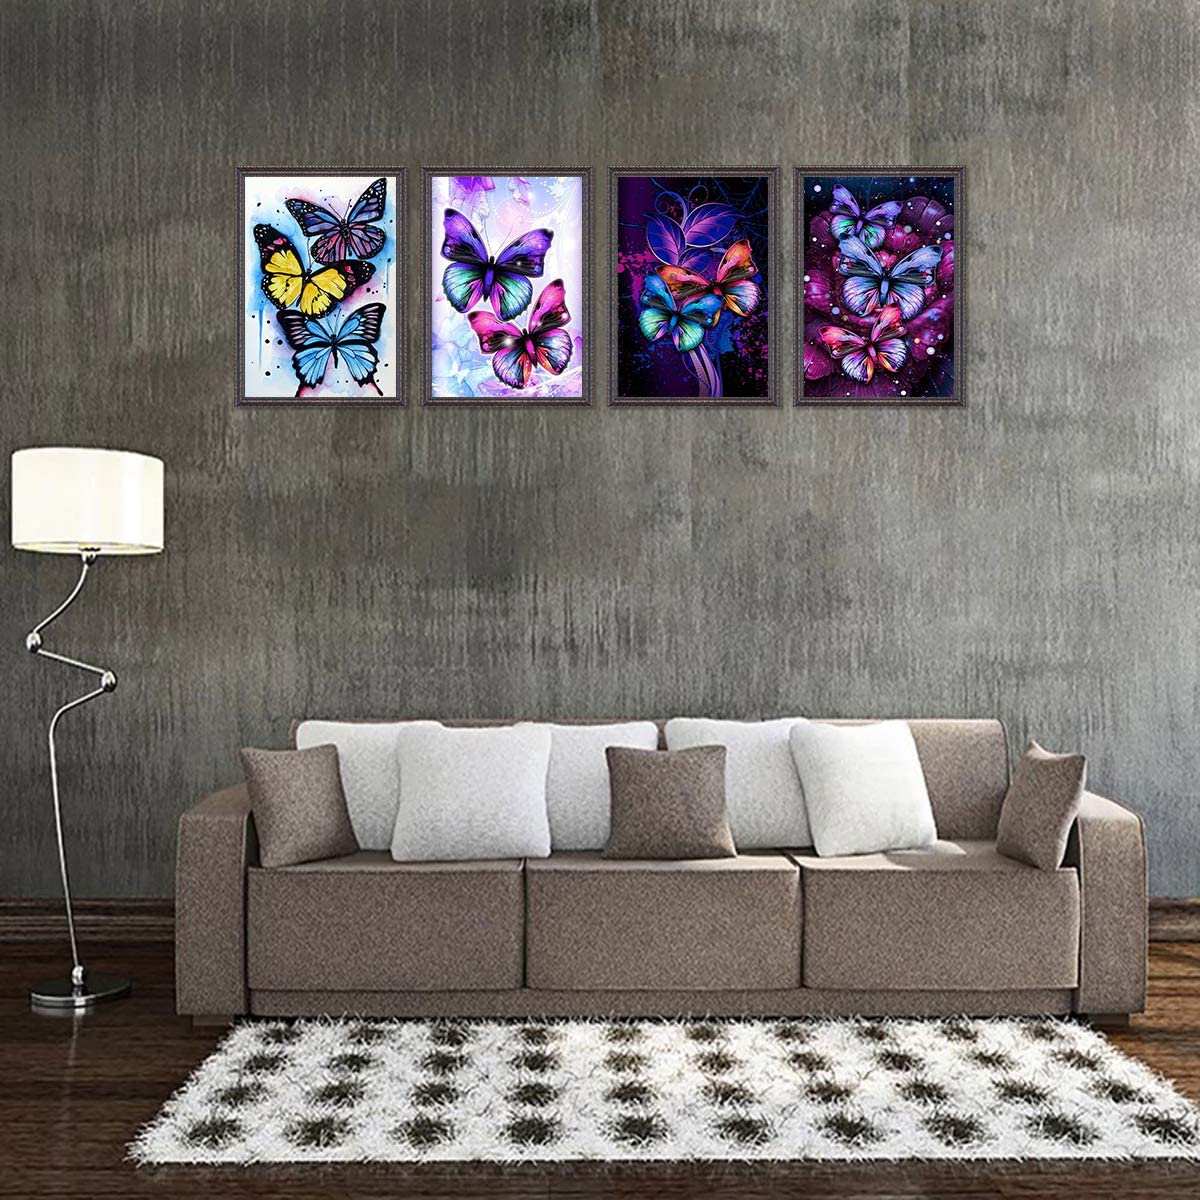 KISSBUTY DIY Butterfly Diamond Rhinestone Painting Kits for Adults and Beginner Butterflies Diamond Arts Craft Decor 13.8 X 9.8 Inch 4 Pack 5D Full Drill Diamond Painting Kit